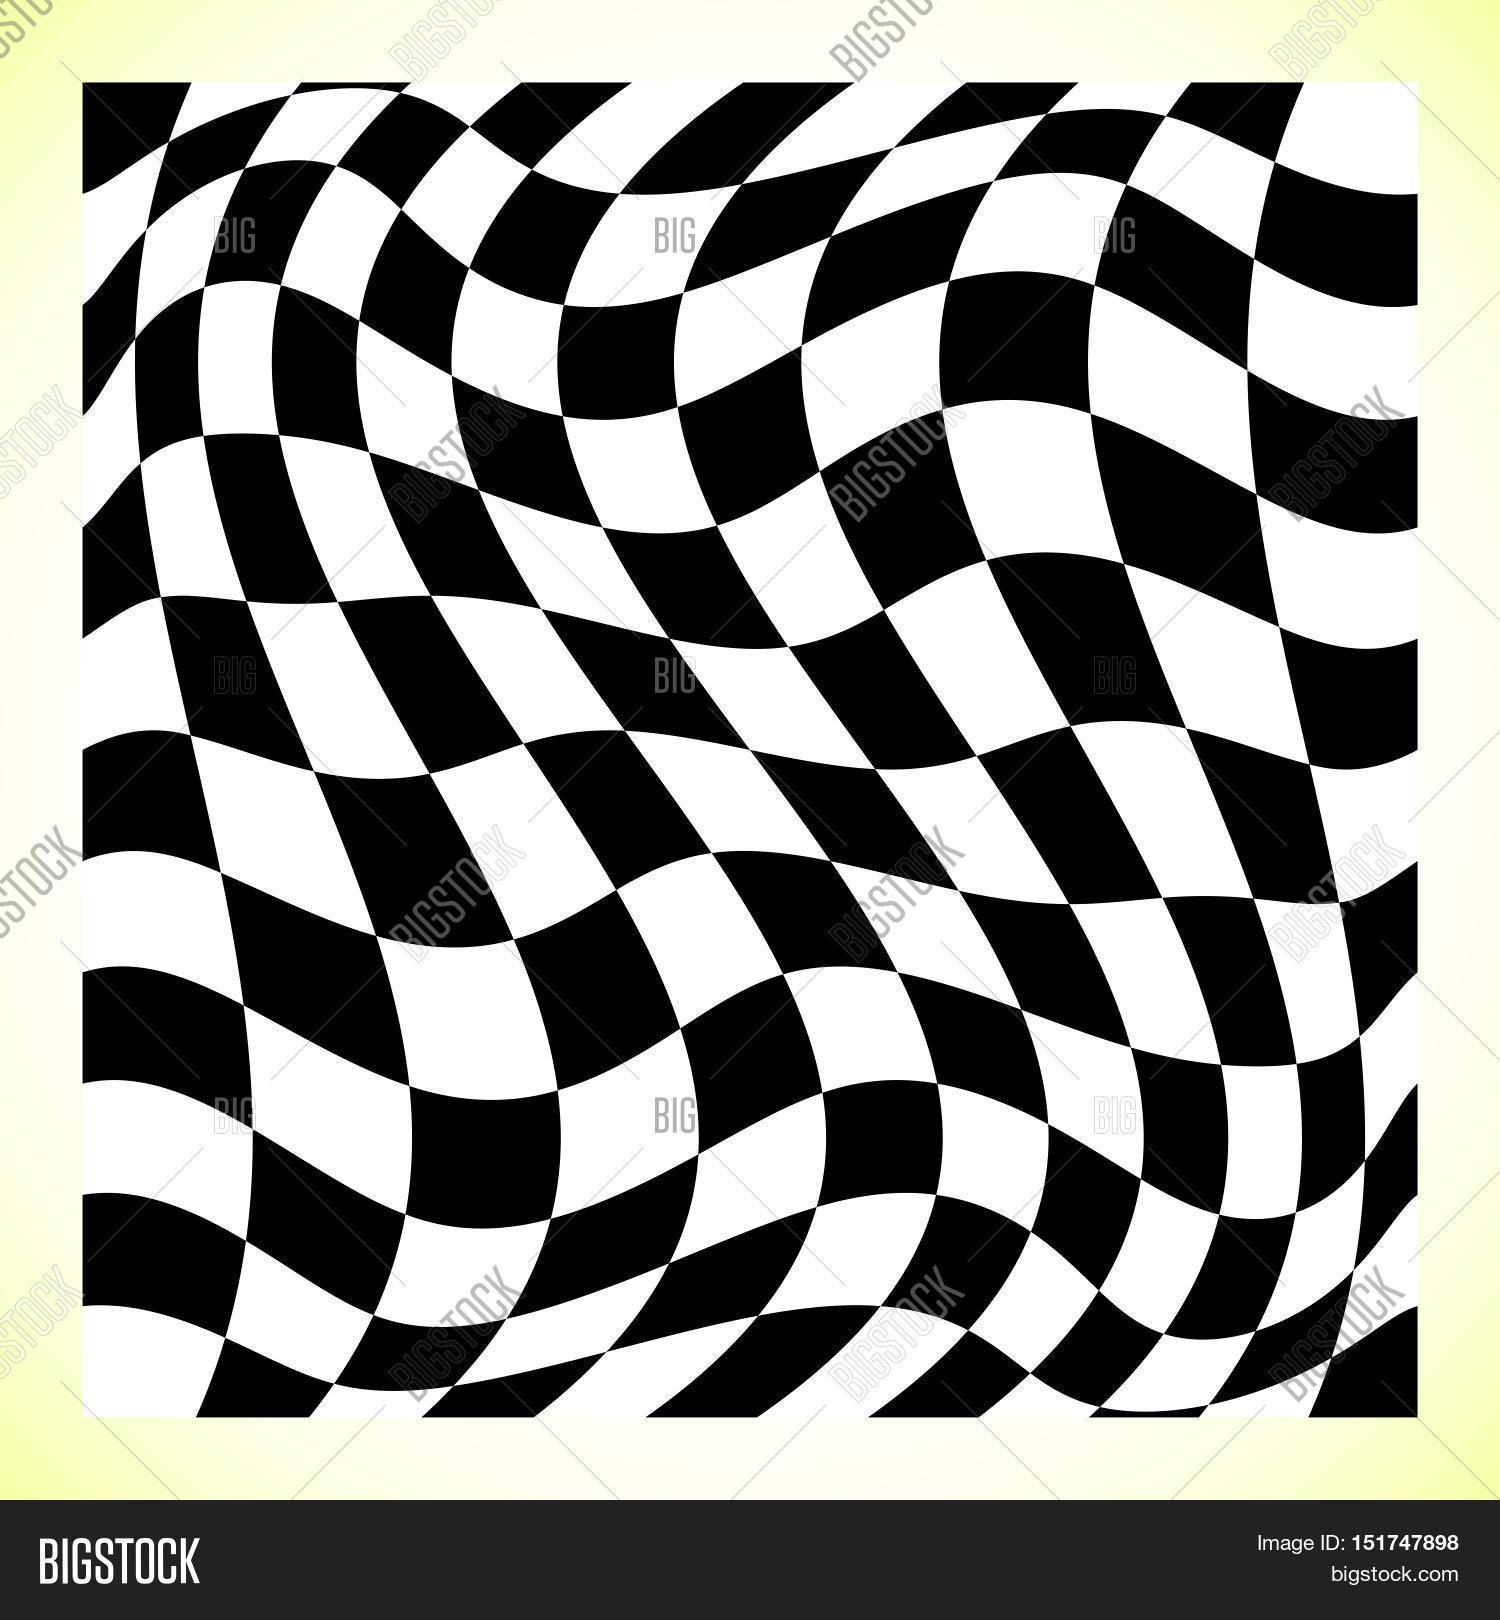 Checkered Design Checkered Pattern Chess Board Checker Board With Distortion